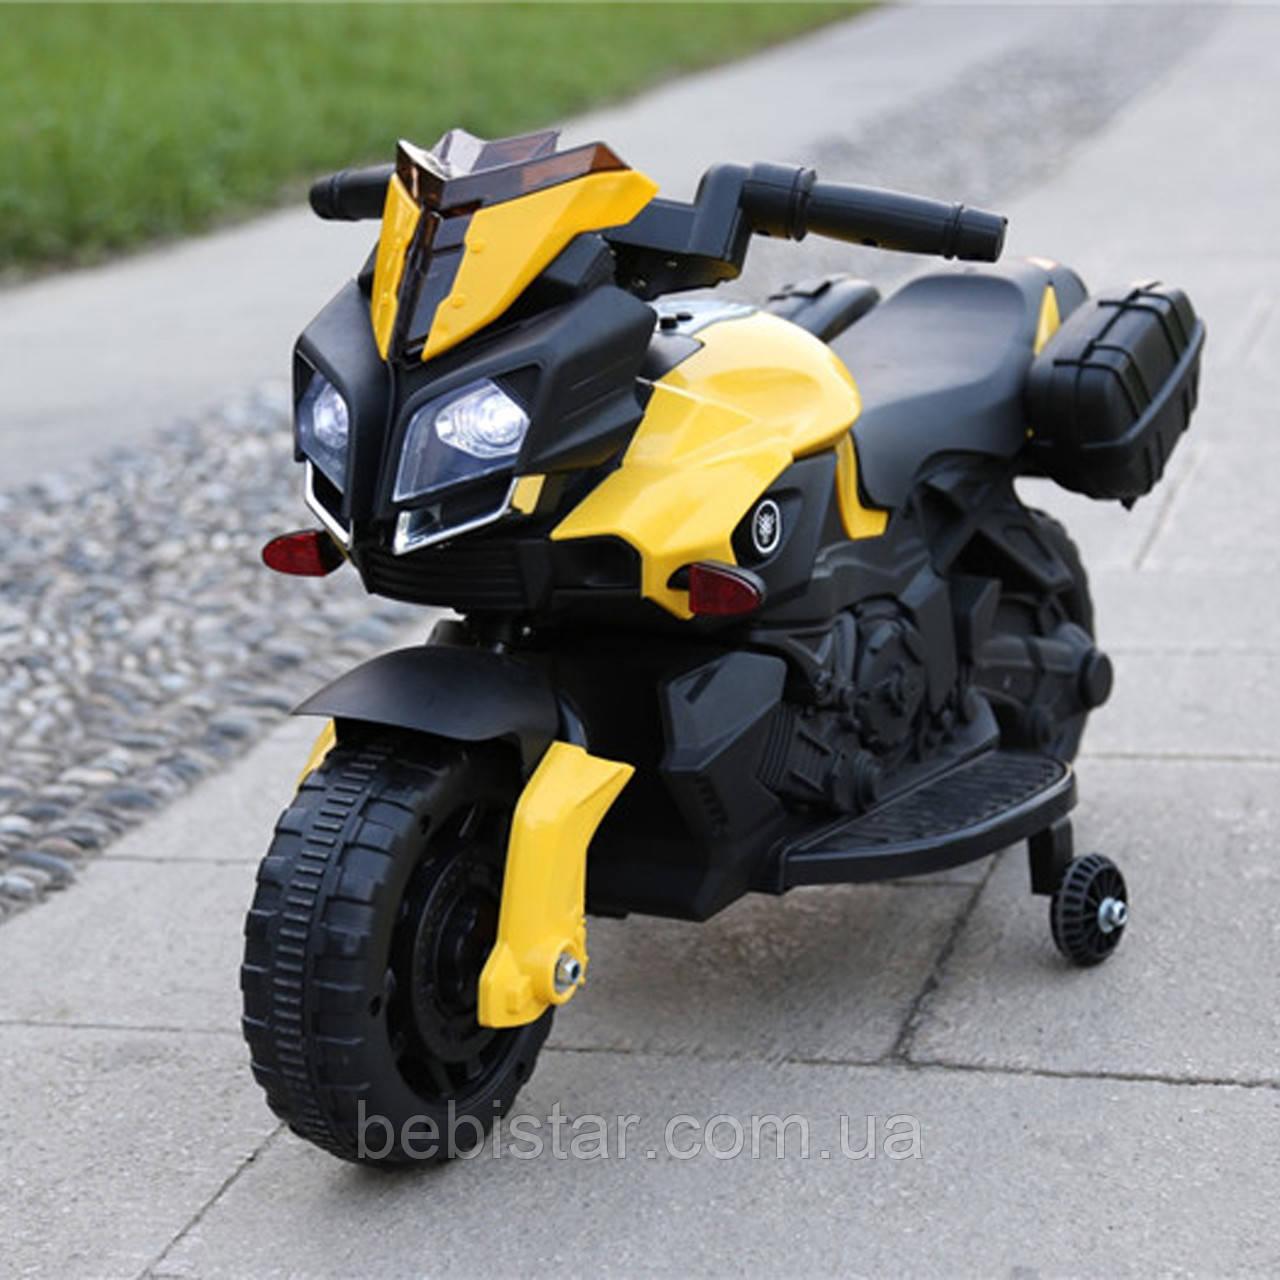 Электромобиль-мотоцикл Т-7218 EVA YELLOW мотор 1*15W аккумулятор 6V4,5AH деткам 2-4 года рост до 105см